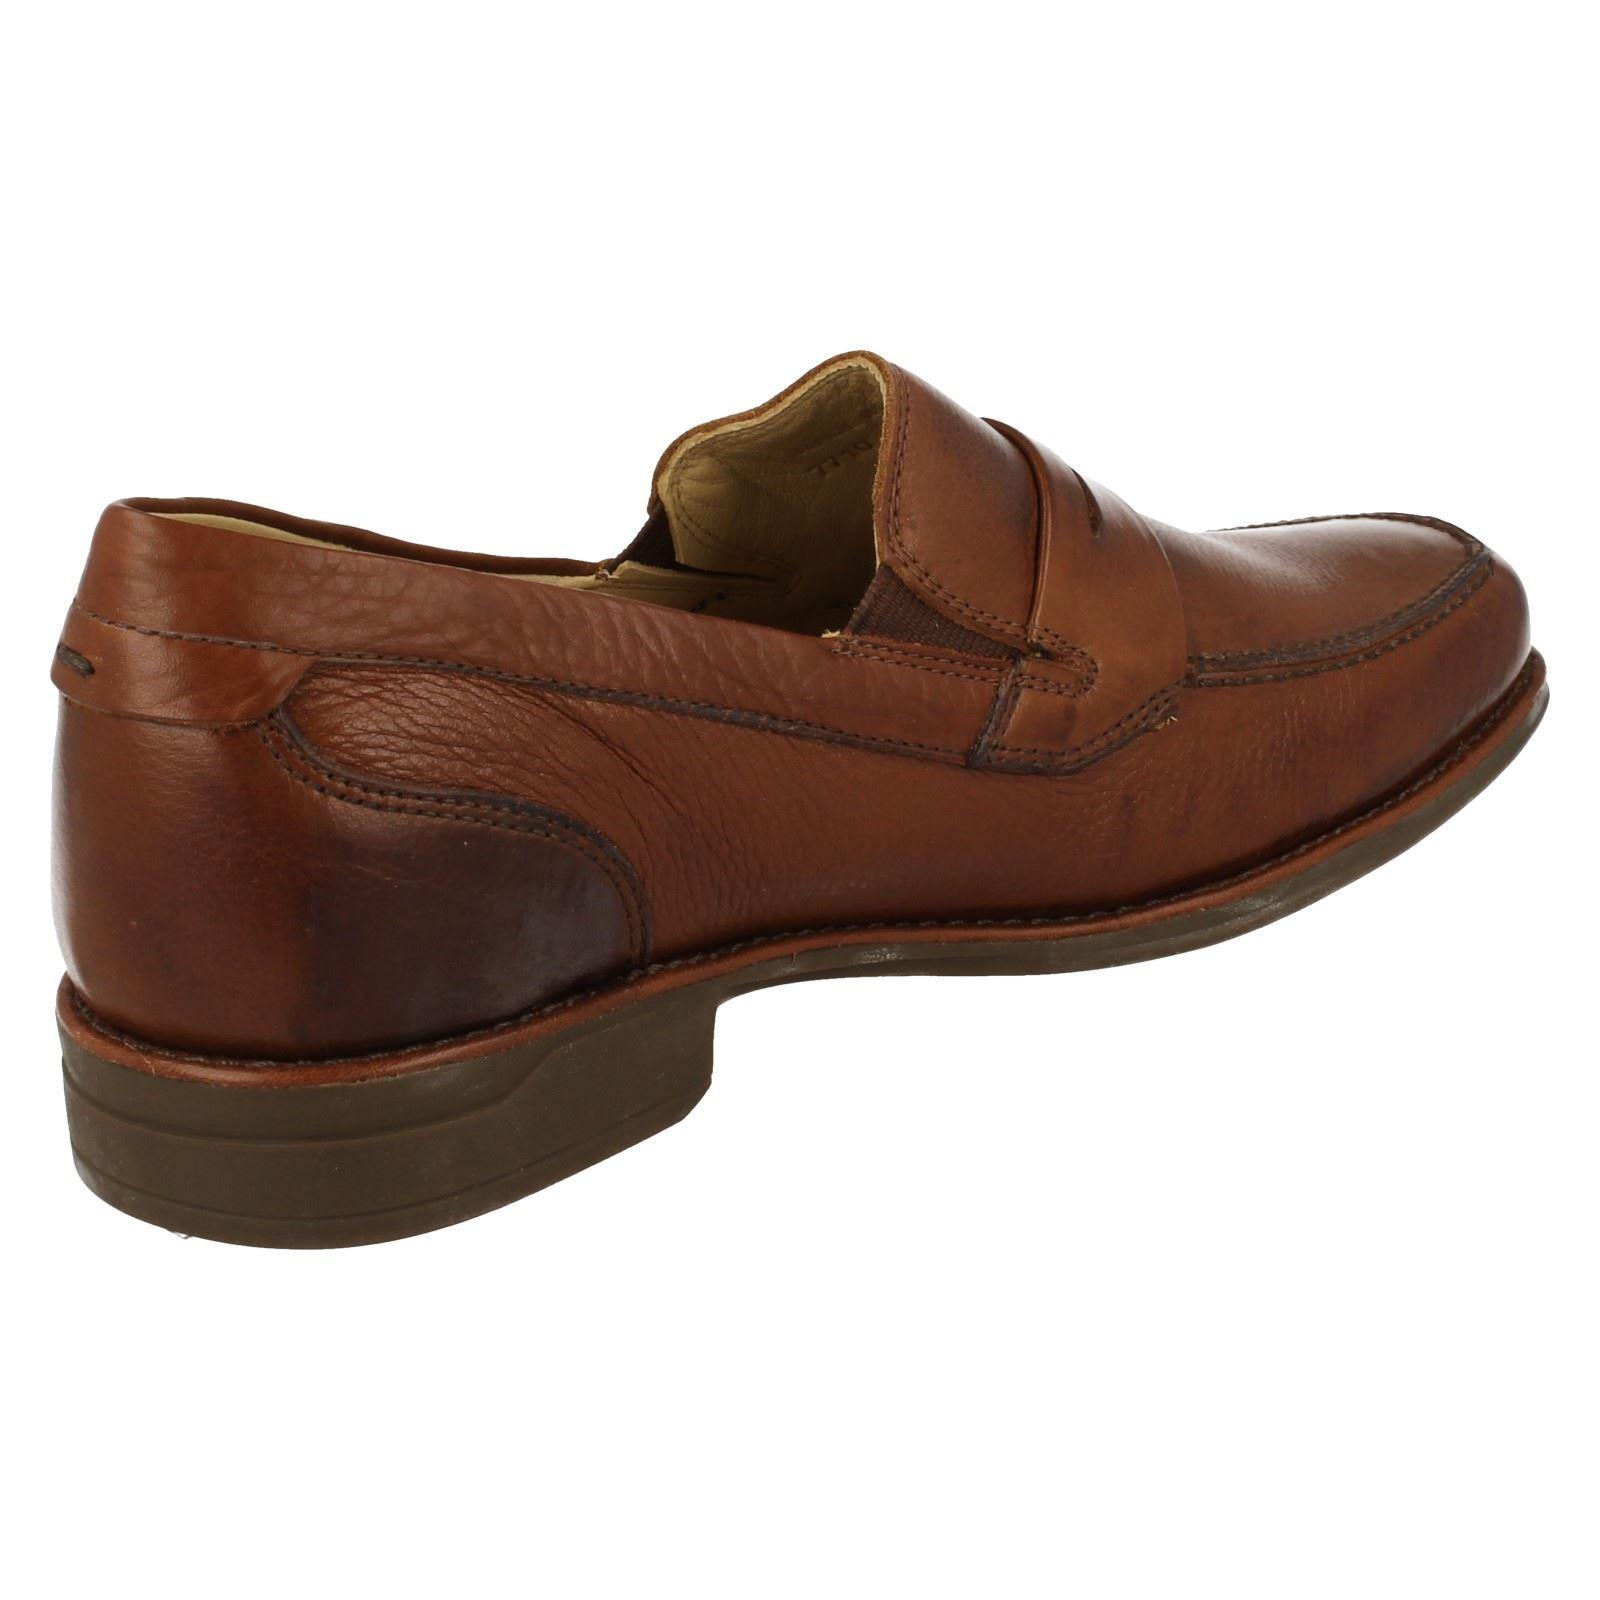 Uomo Anatomic & Co Formal Slip Slip Slip On Schuhes Barbosa b7ebaa